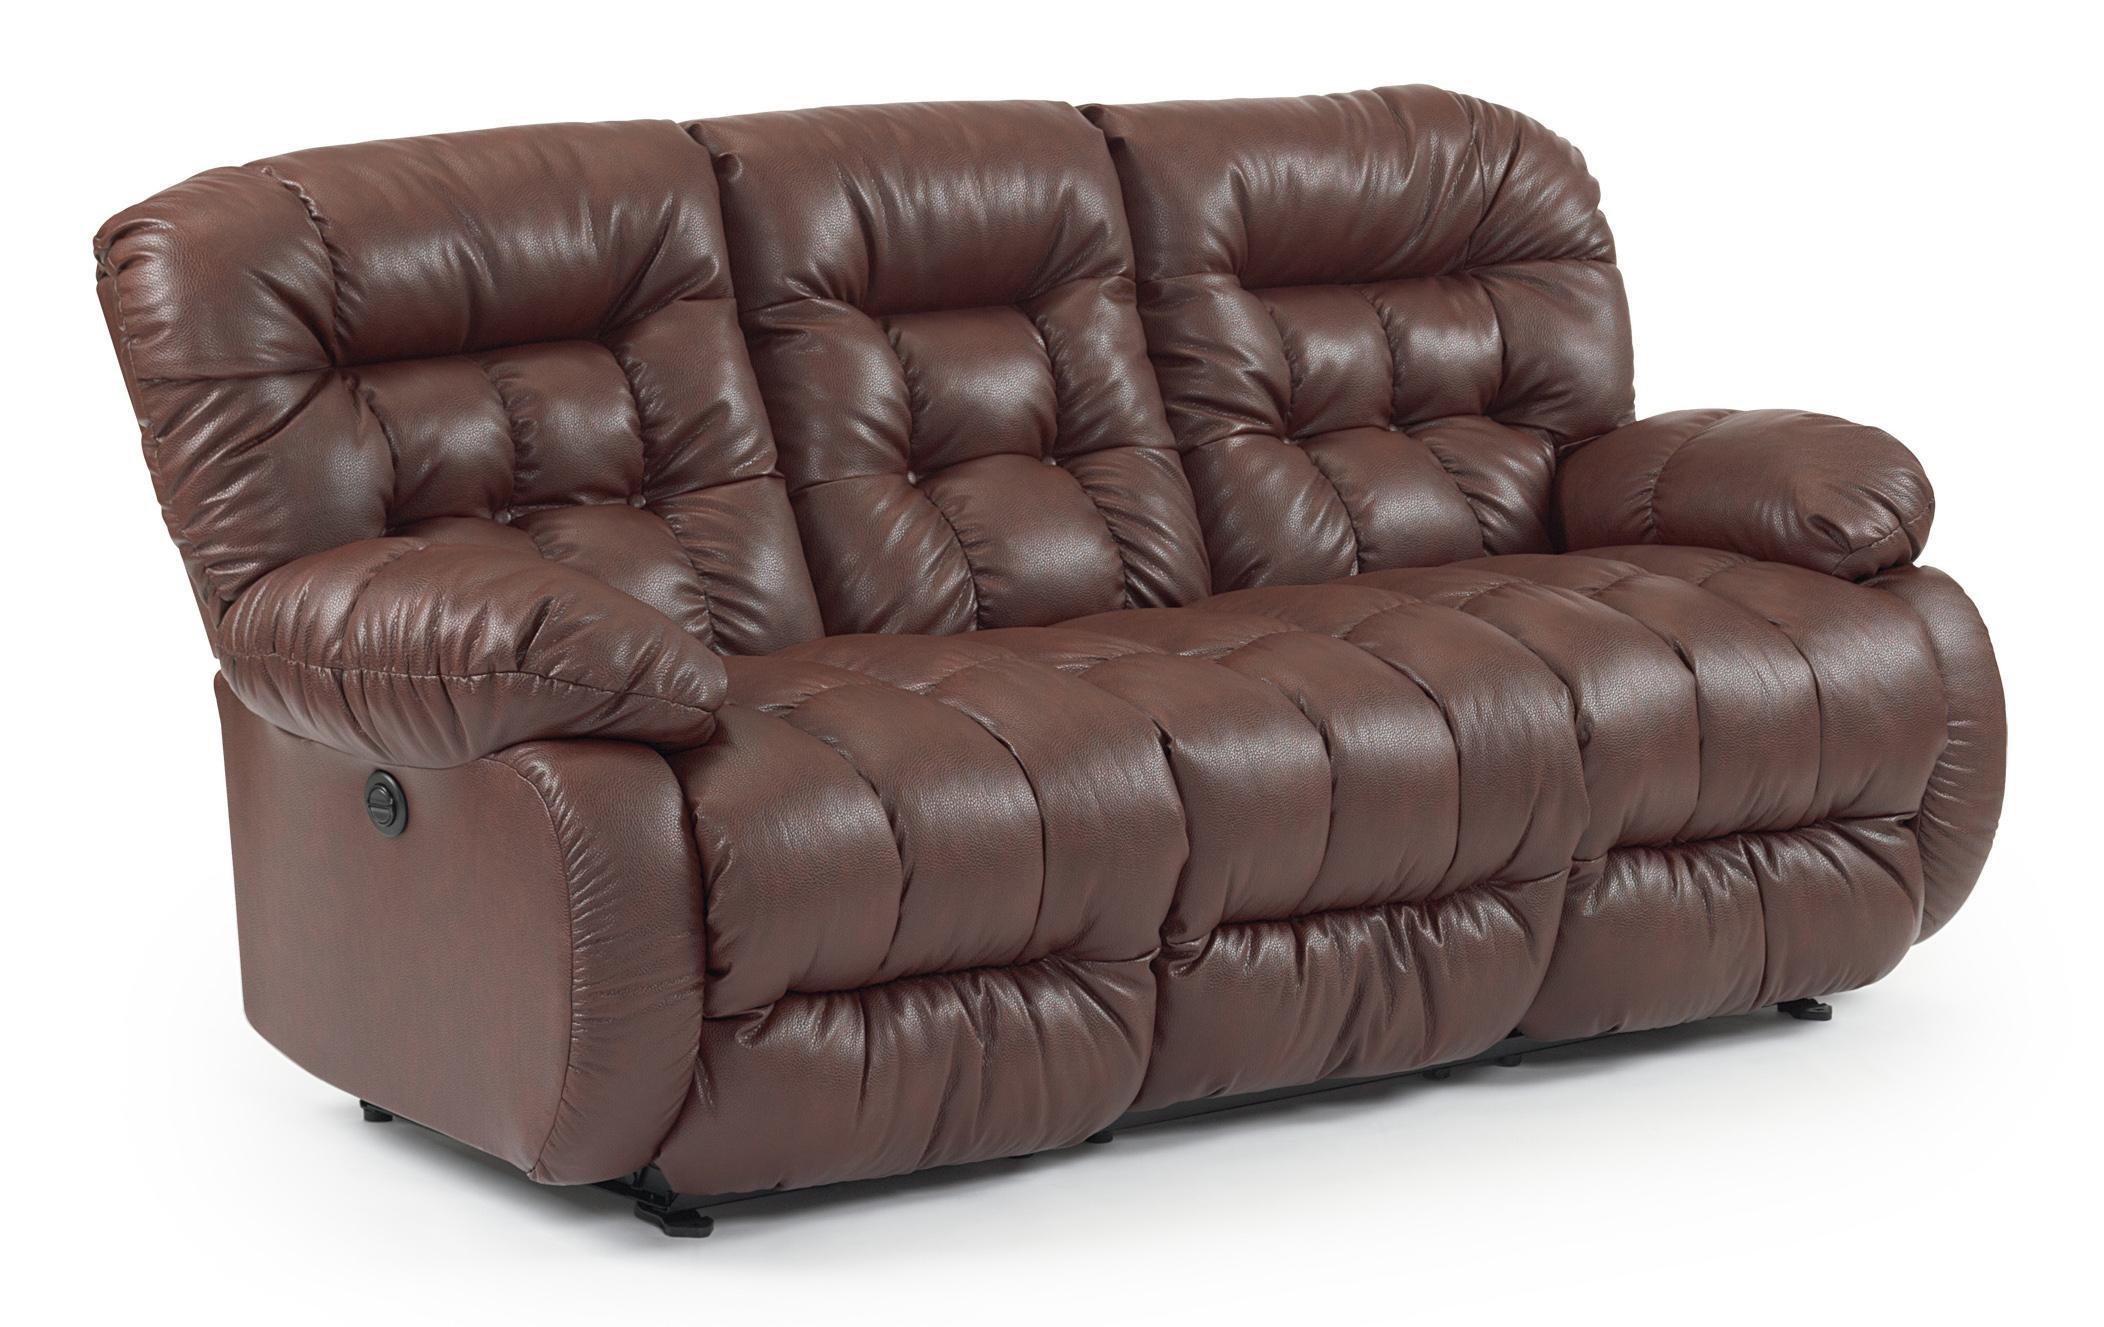 Best Home Furnishings Plusher Space Saver Reclining Sofa